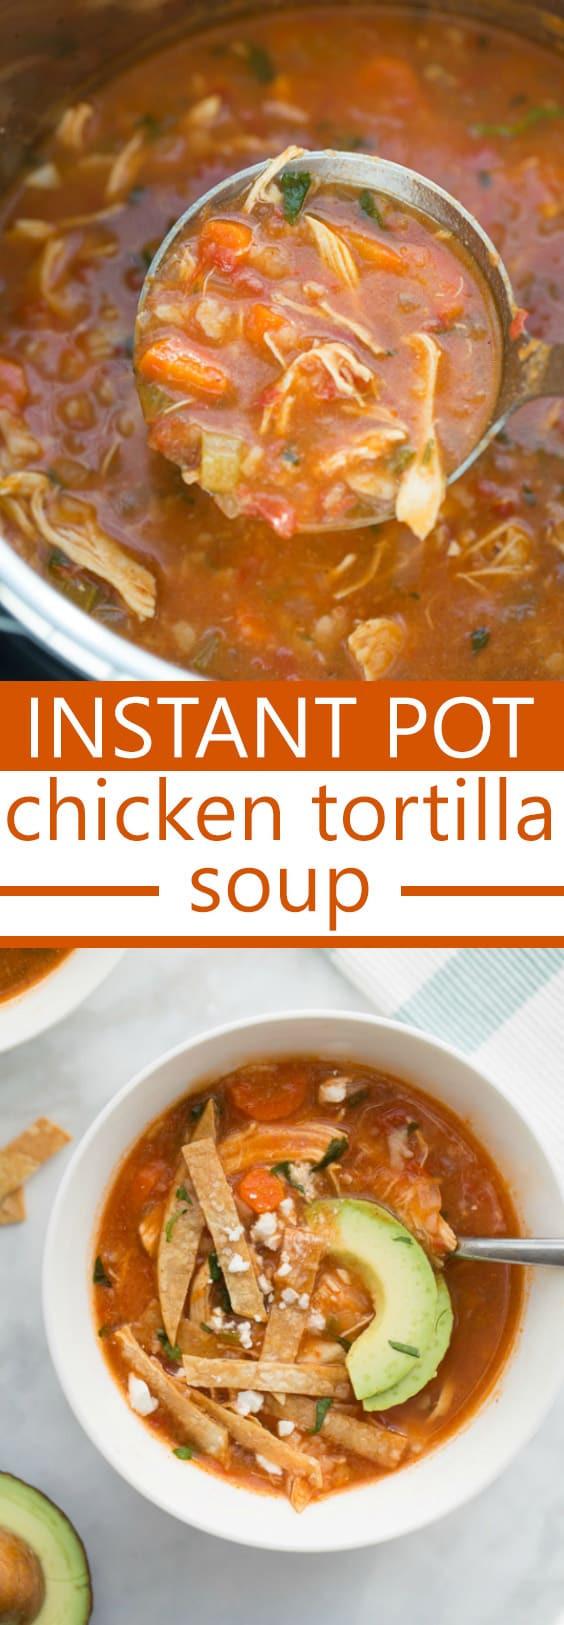 Chicken Tortilla Soup Instant Pot  Instant Pot Chicken Tortilla Soup Meaningful Eats